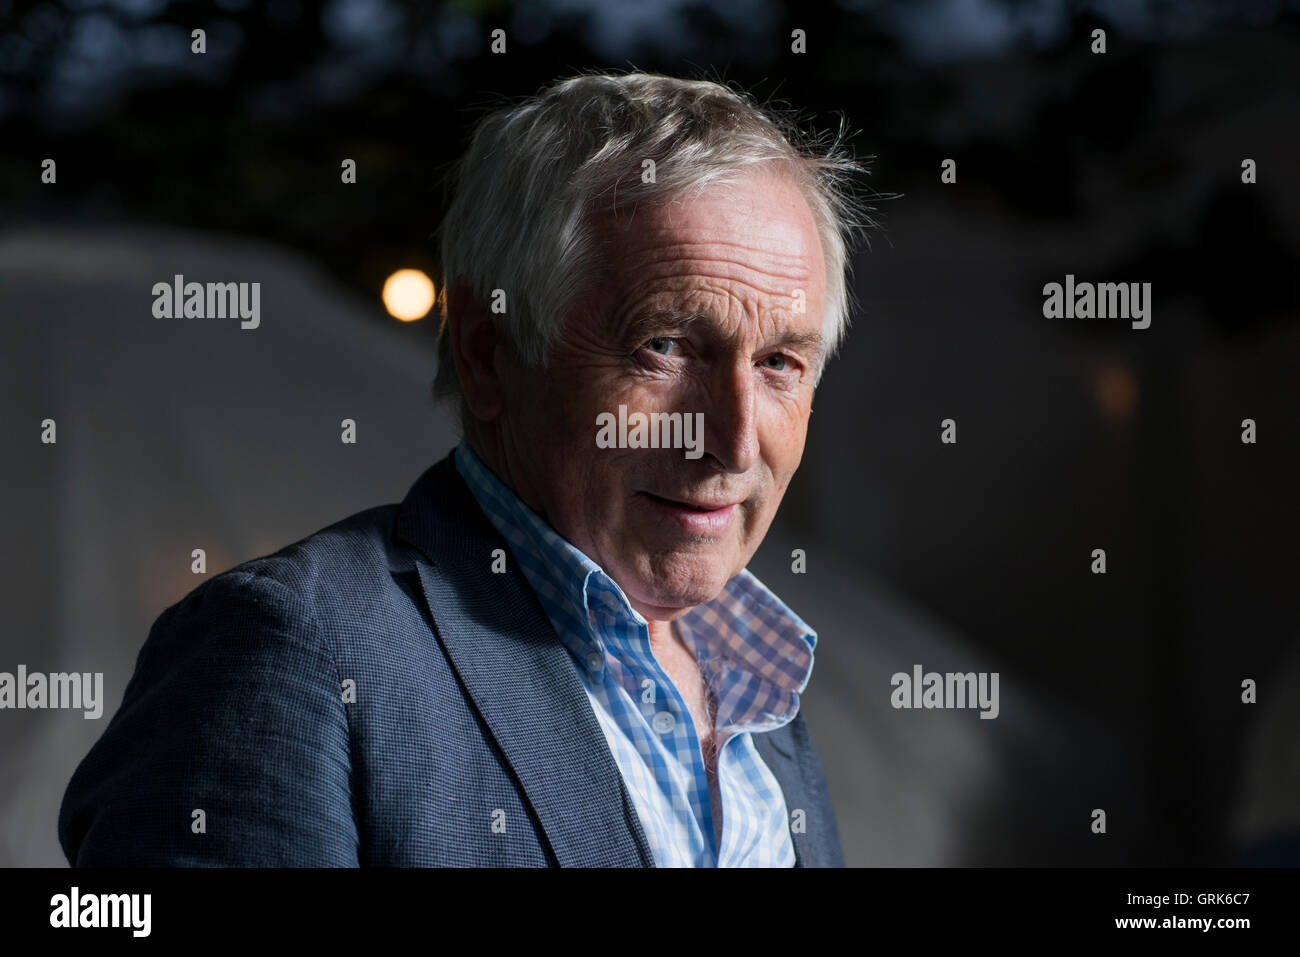 British presenter, political commentator and writer Jonathan Dimbleby. - Stock Image